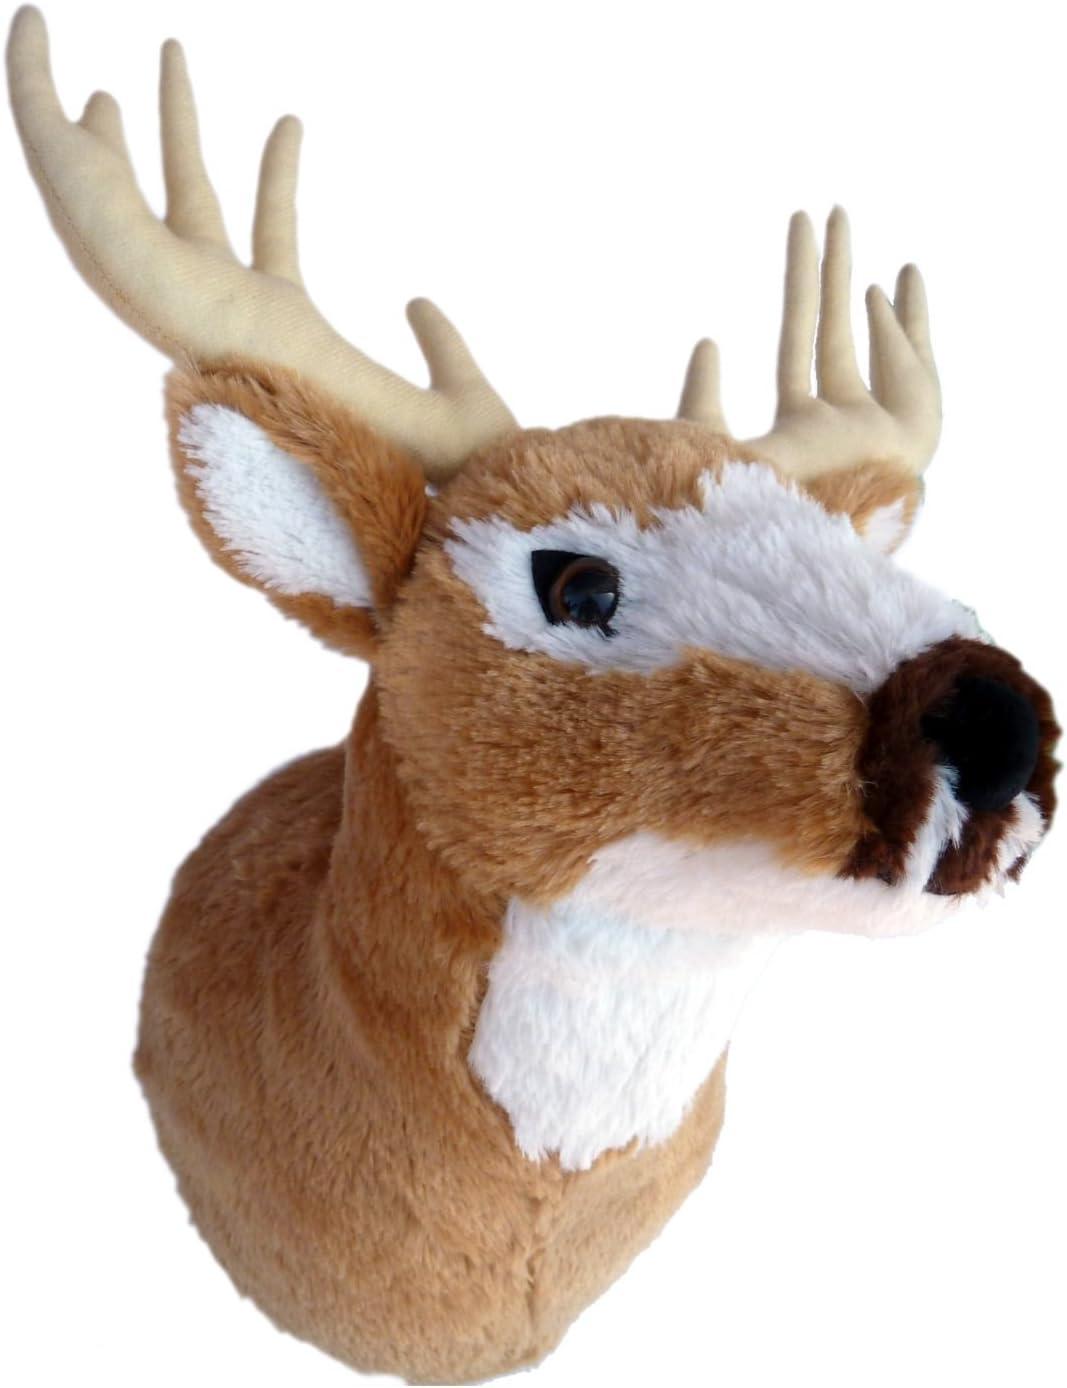 "ADORE 13"" Mr. Yosemite the Deer Plush Stuffed Animal Walltoy Wall Mount"